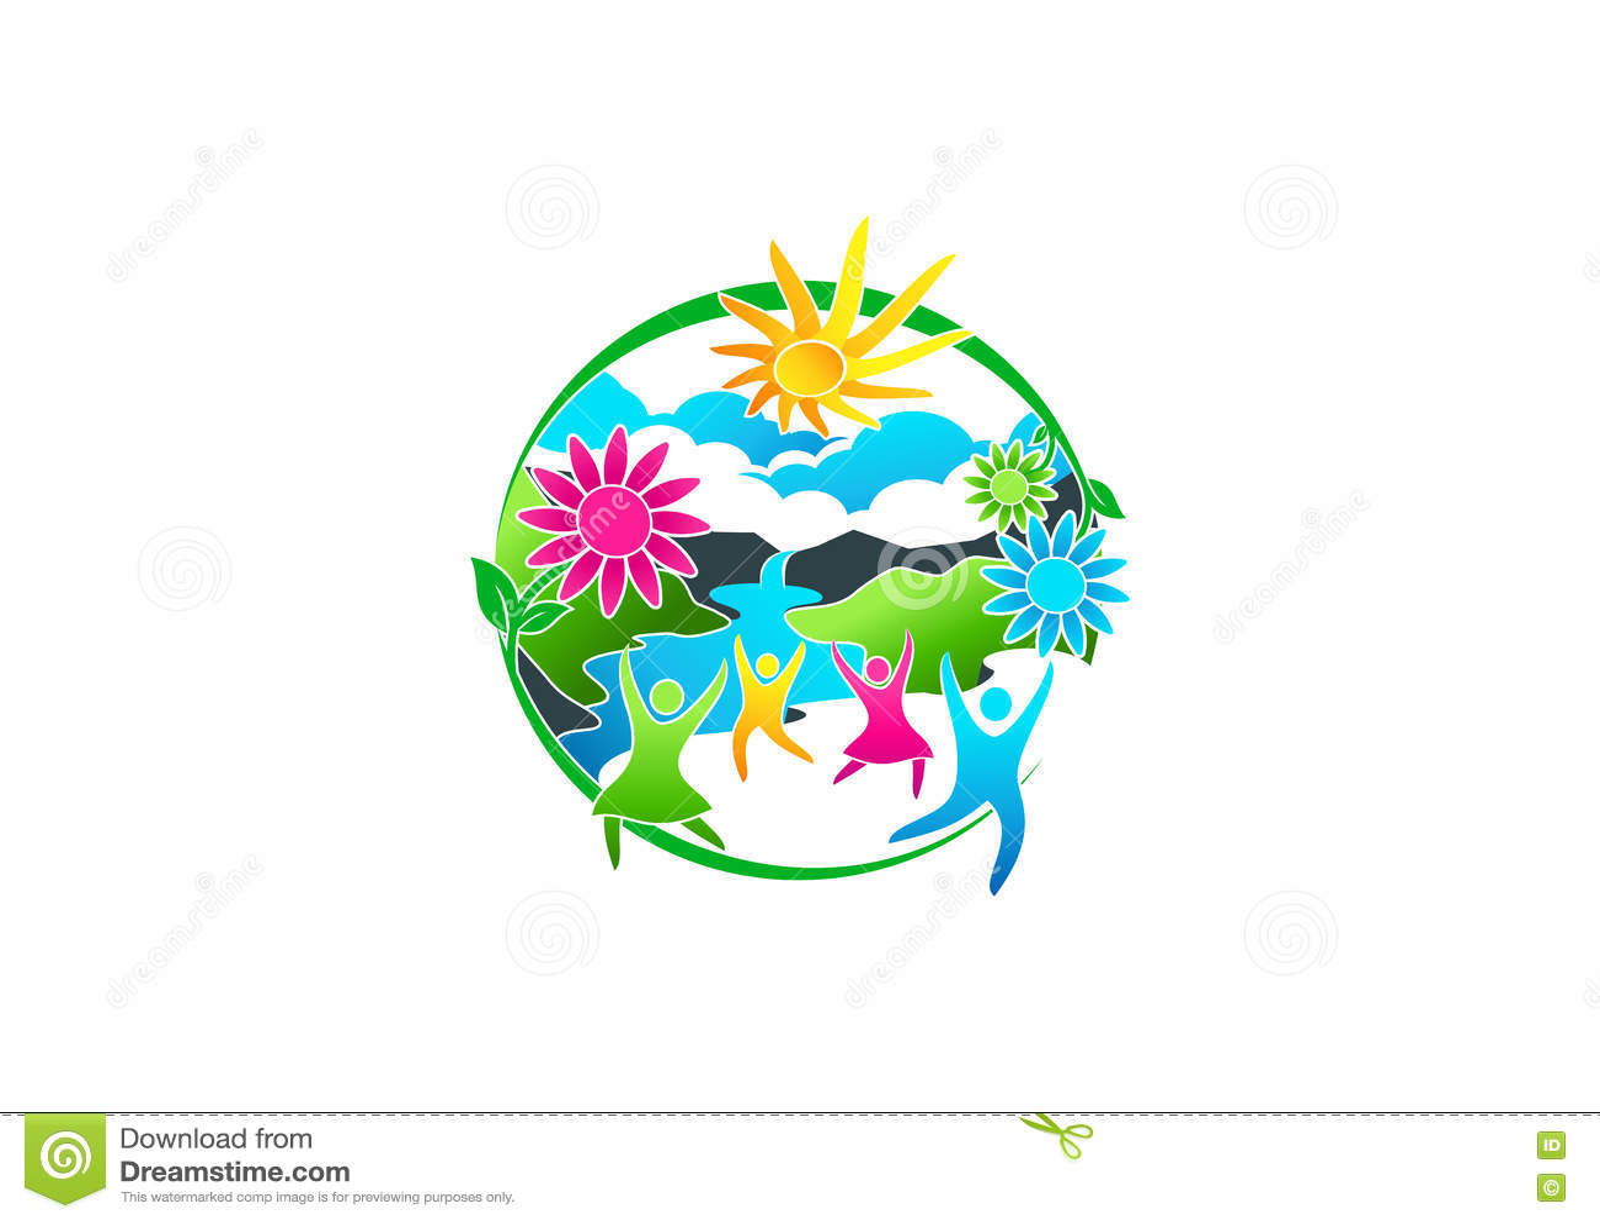 Wellness, embleem, de lente, bloem, pictogram, de zomer, rivier, symbool en gezond mensenconceptontwerp